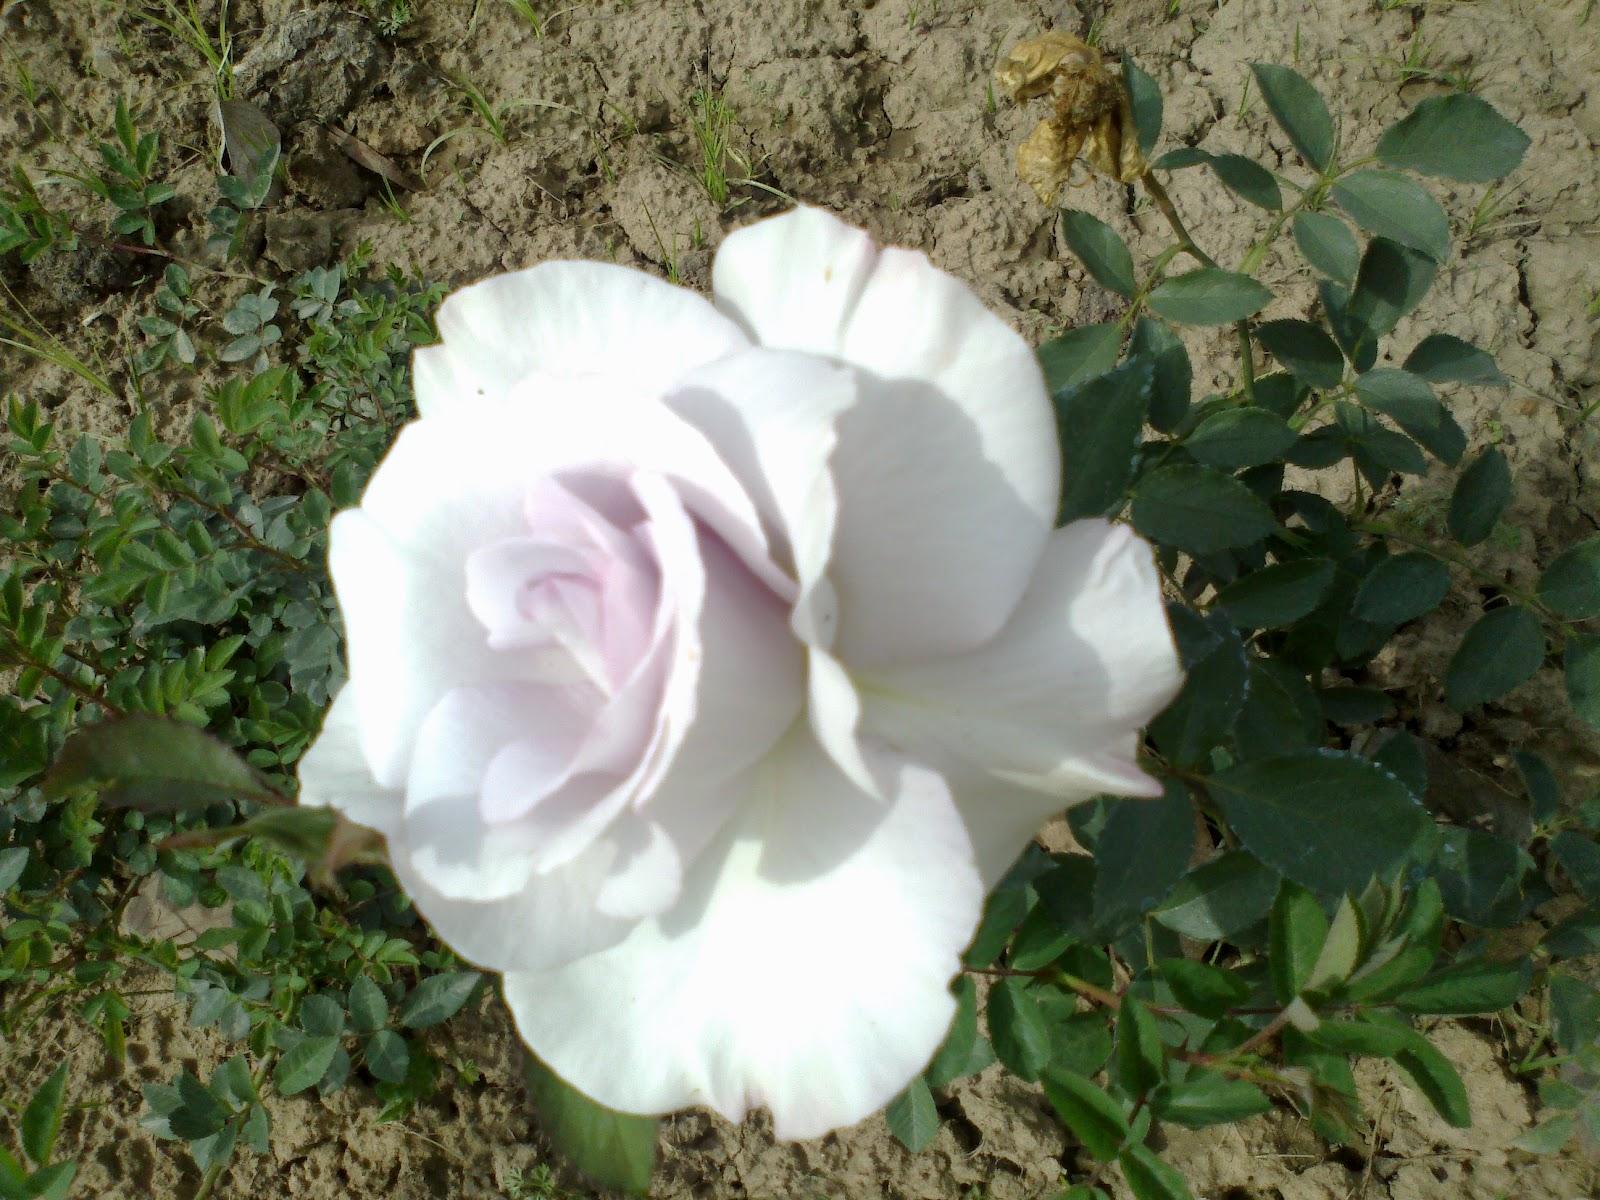 I Love Roses Trip To Rose Garden Chandigarh